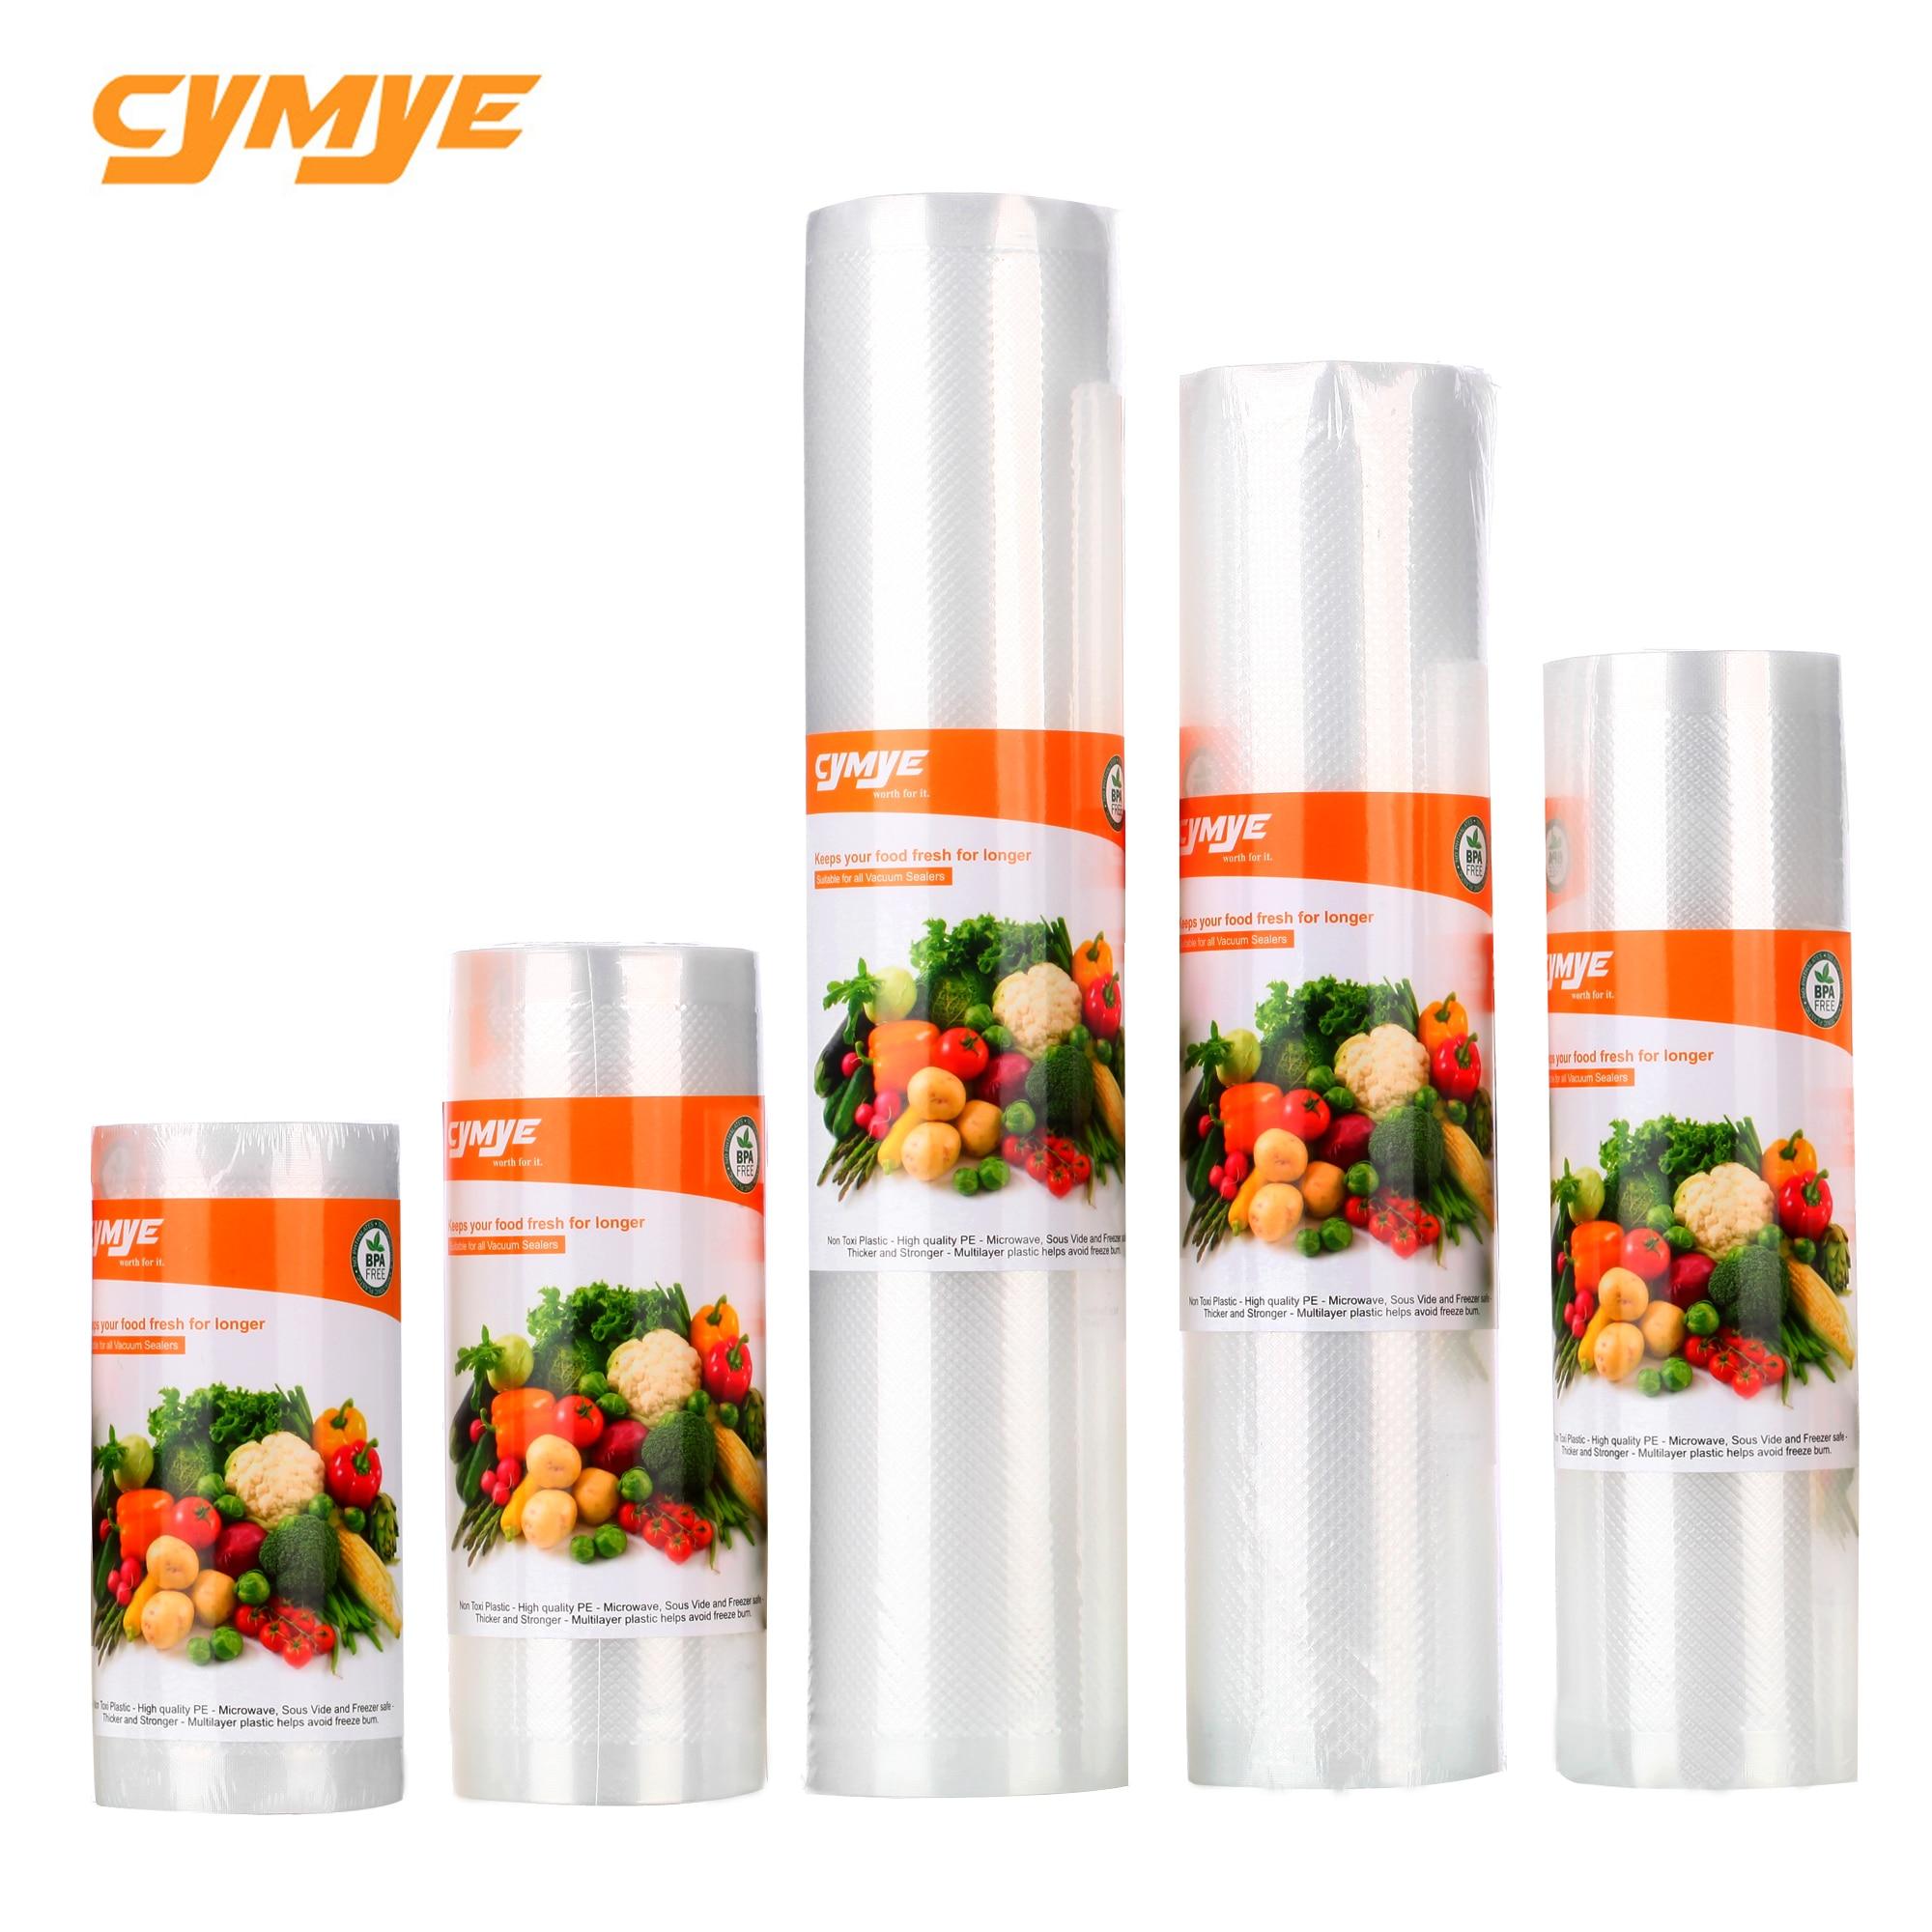 Cymye Food Saver Storage Plastic Bags For Food Vacuum Sealer